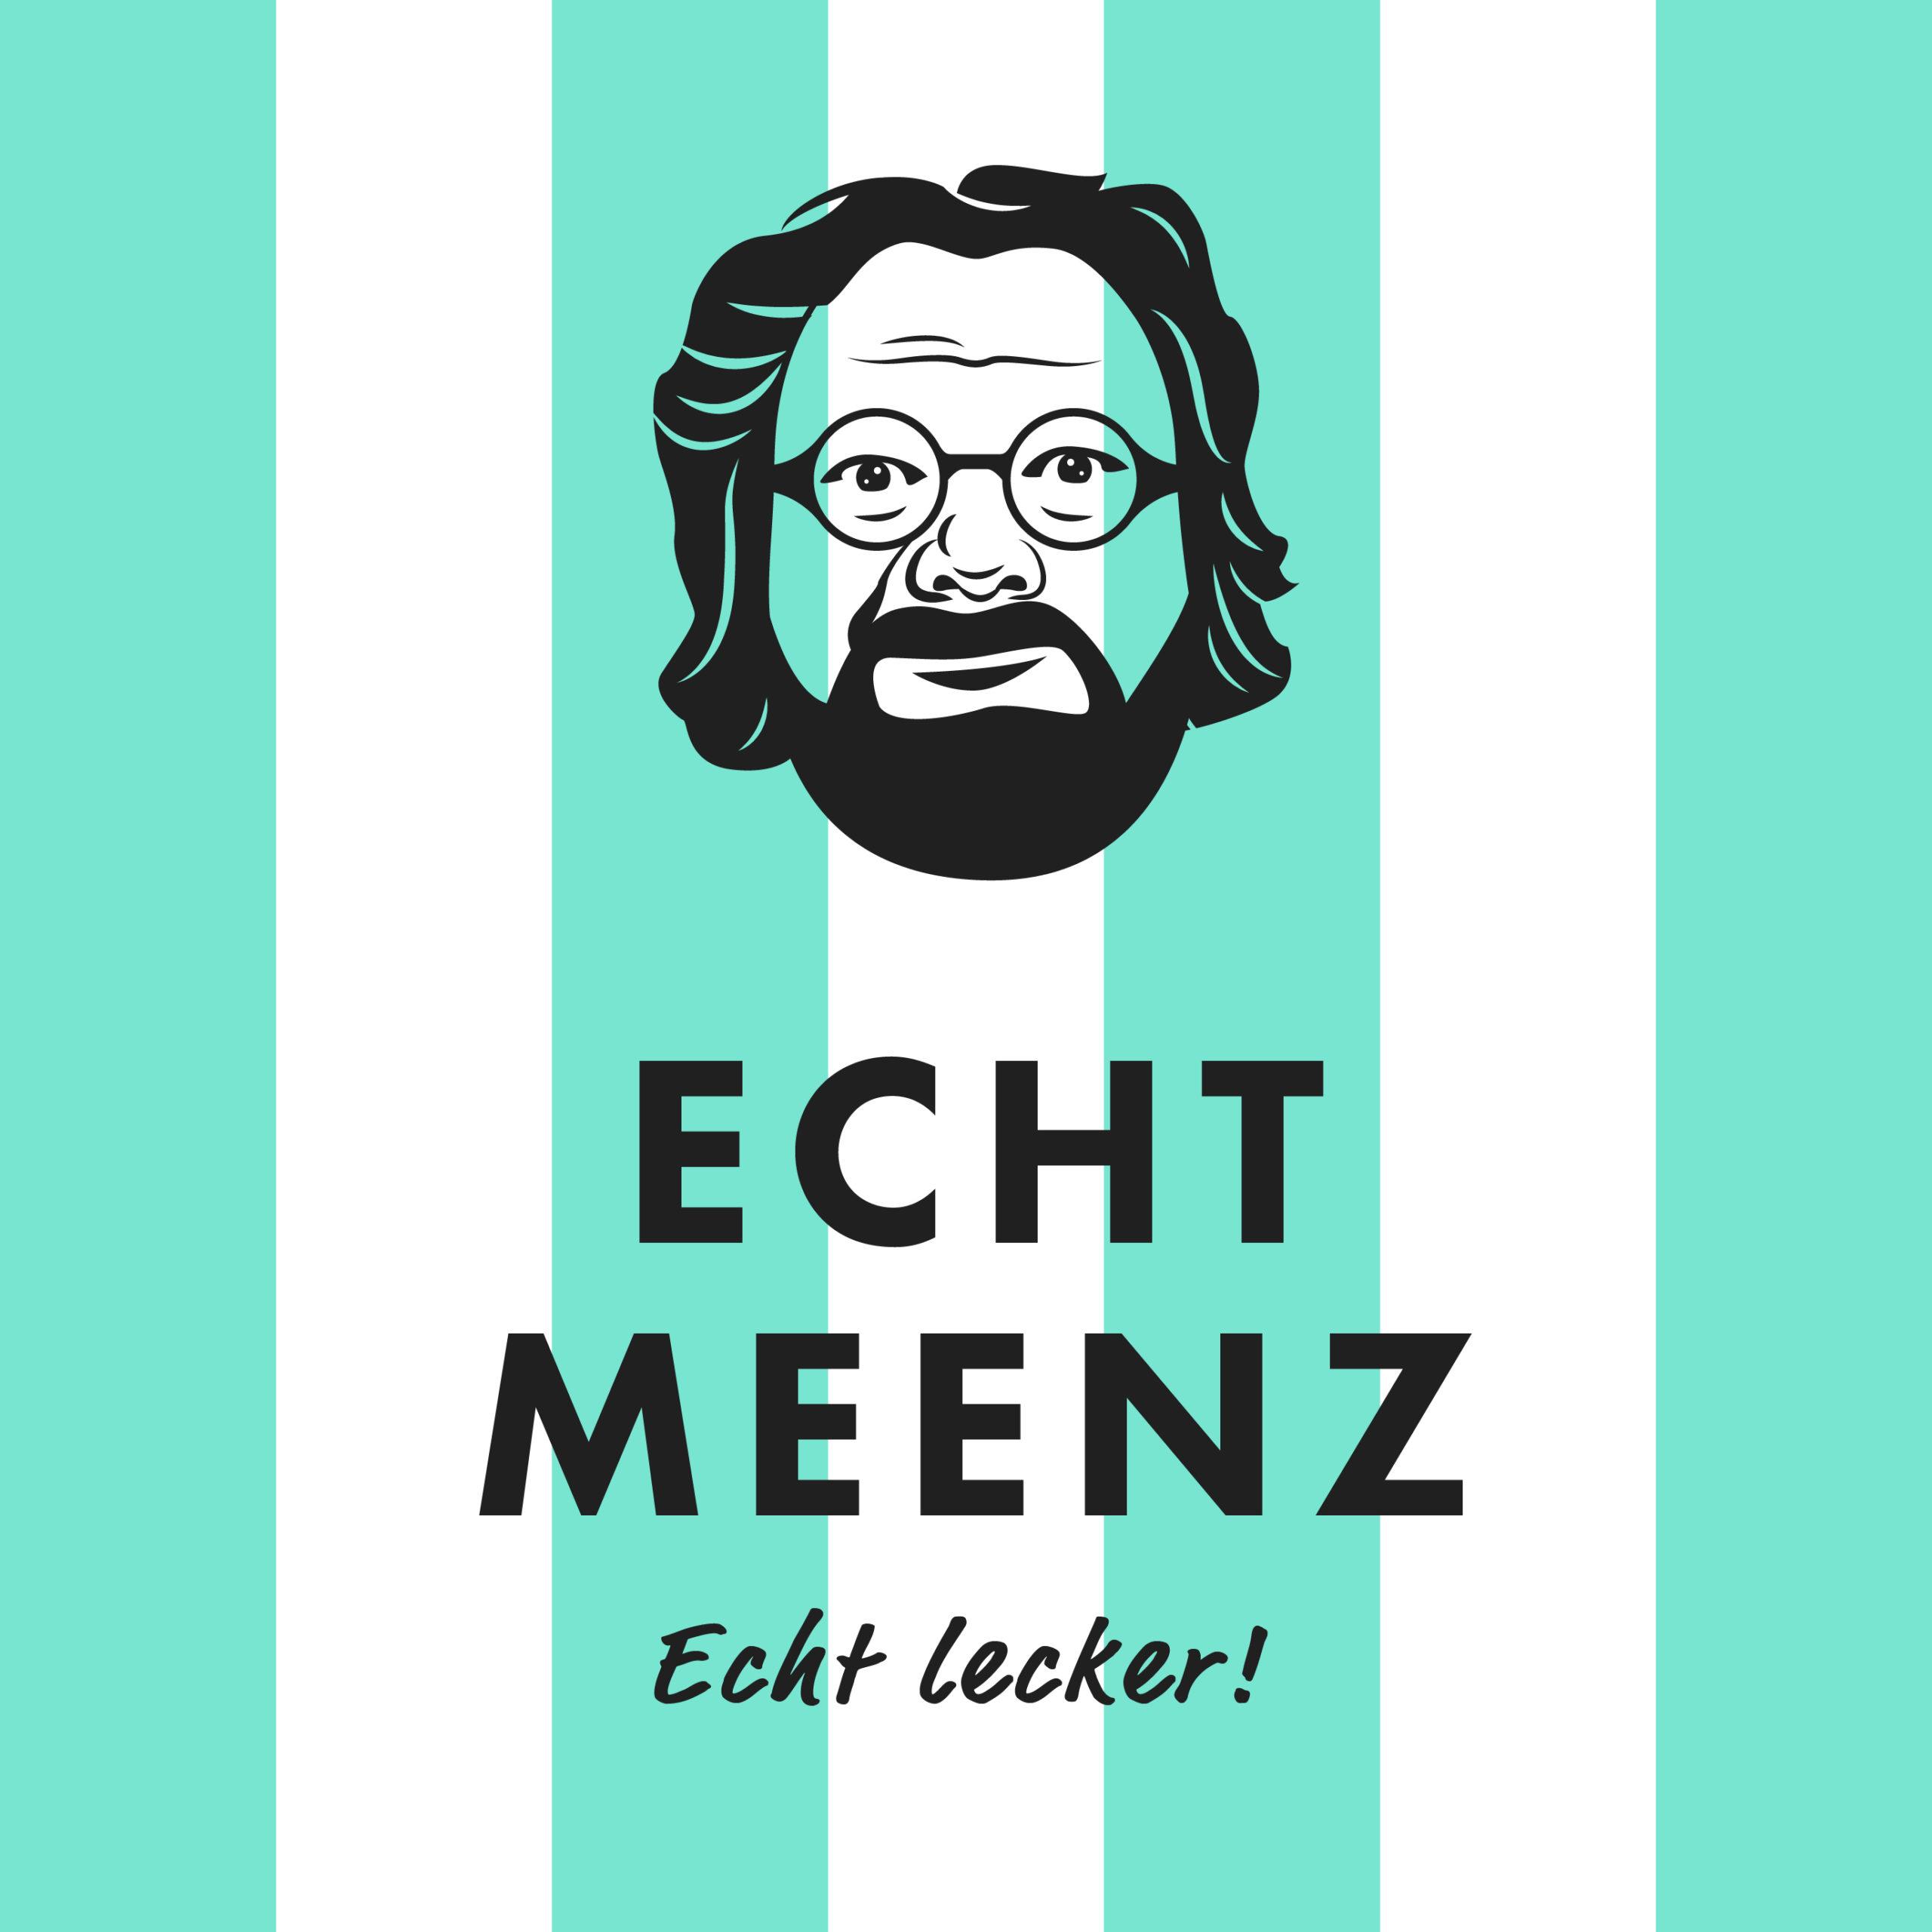 Echt Meenz, Alexander Schäfer, Bahnhofsviertel Mainz